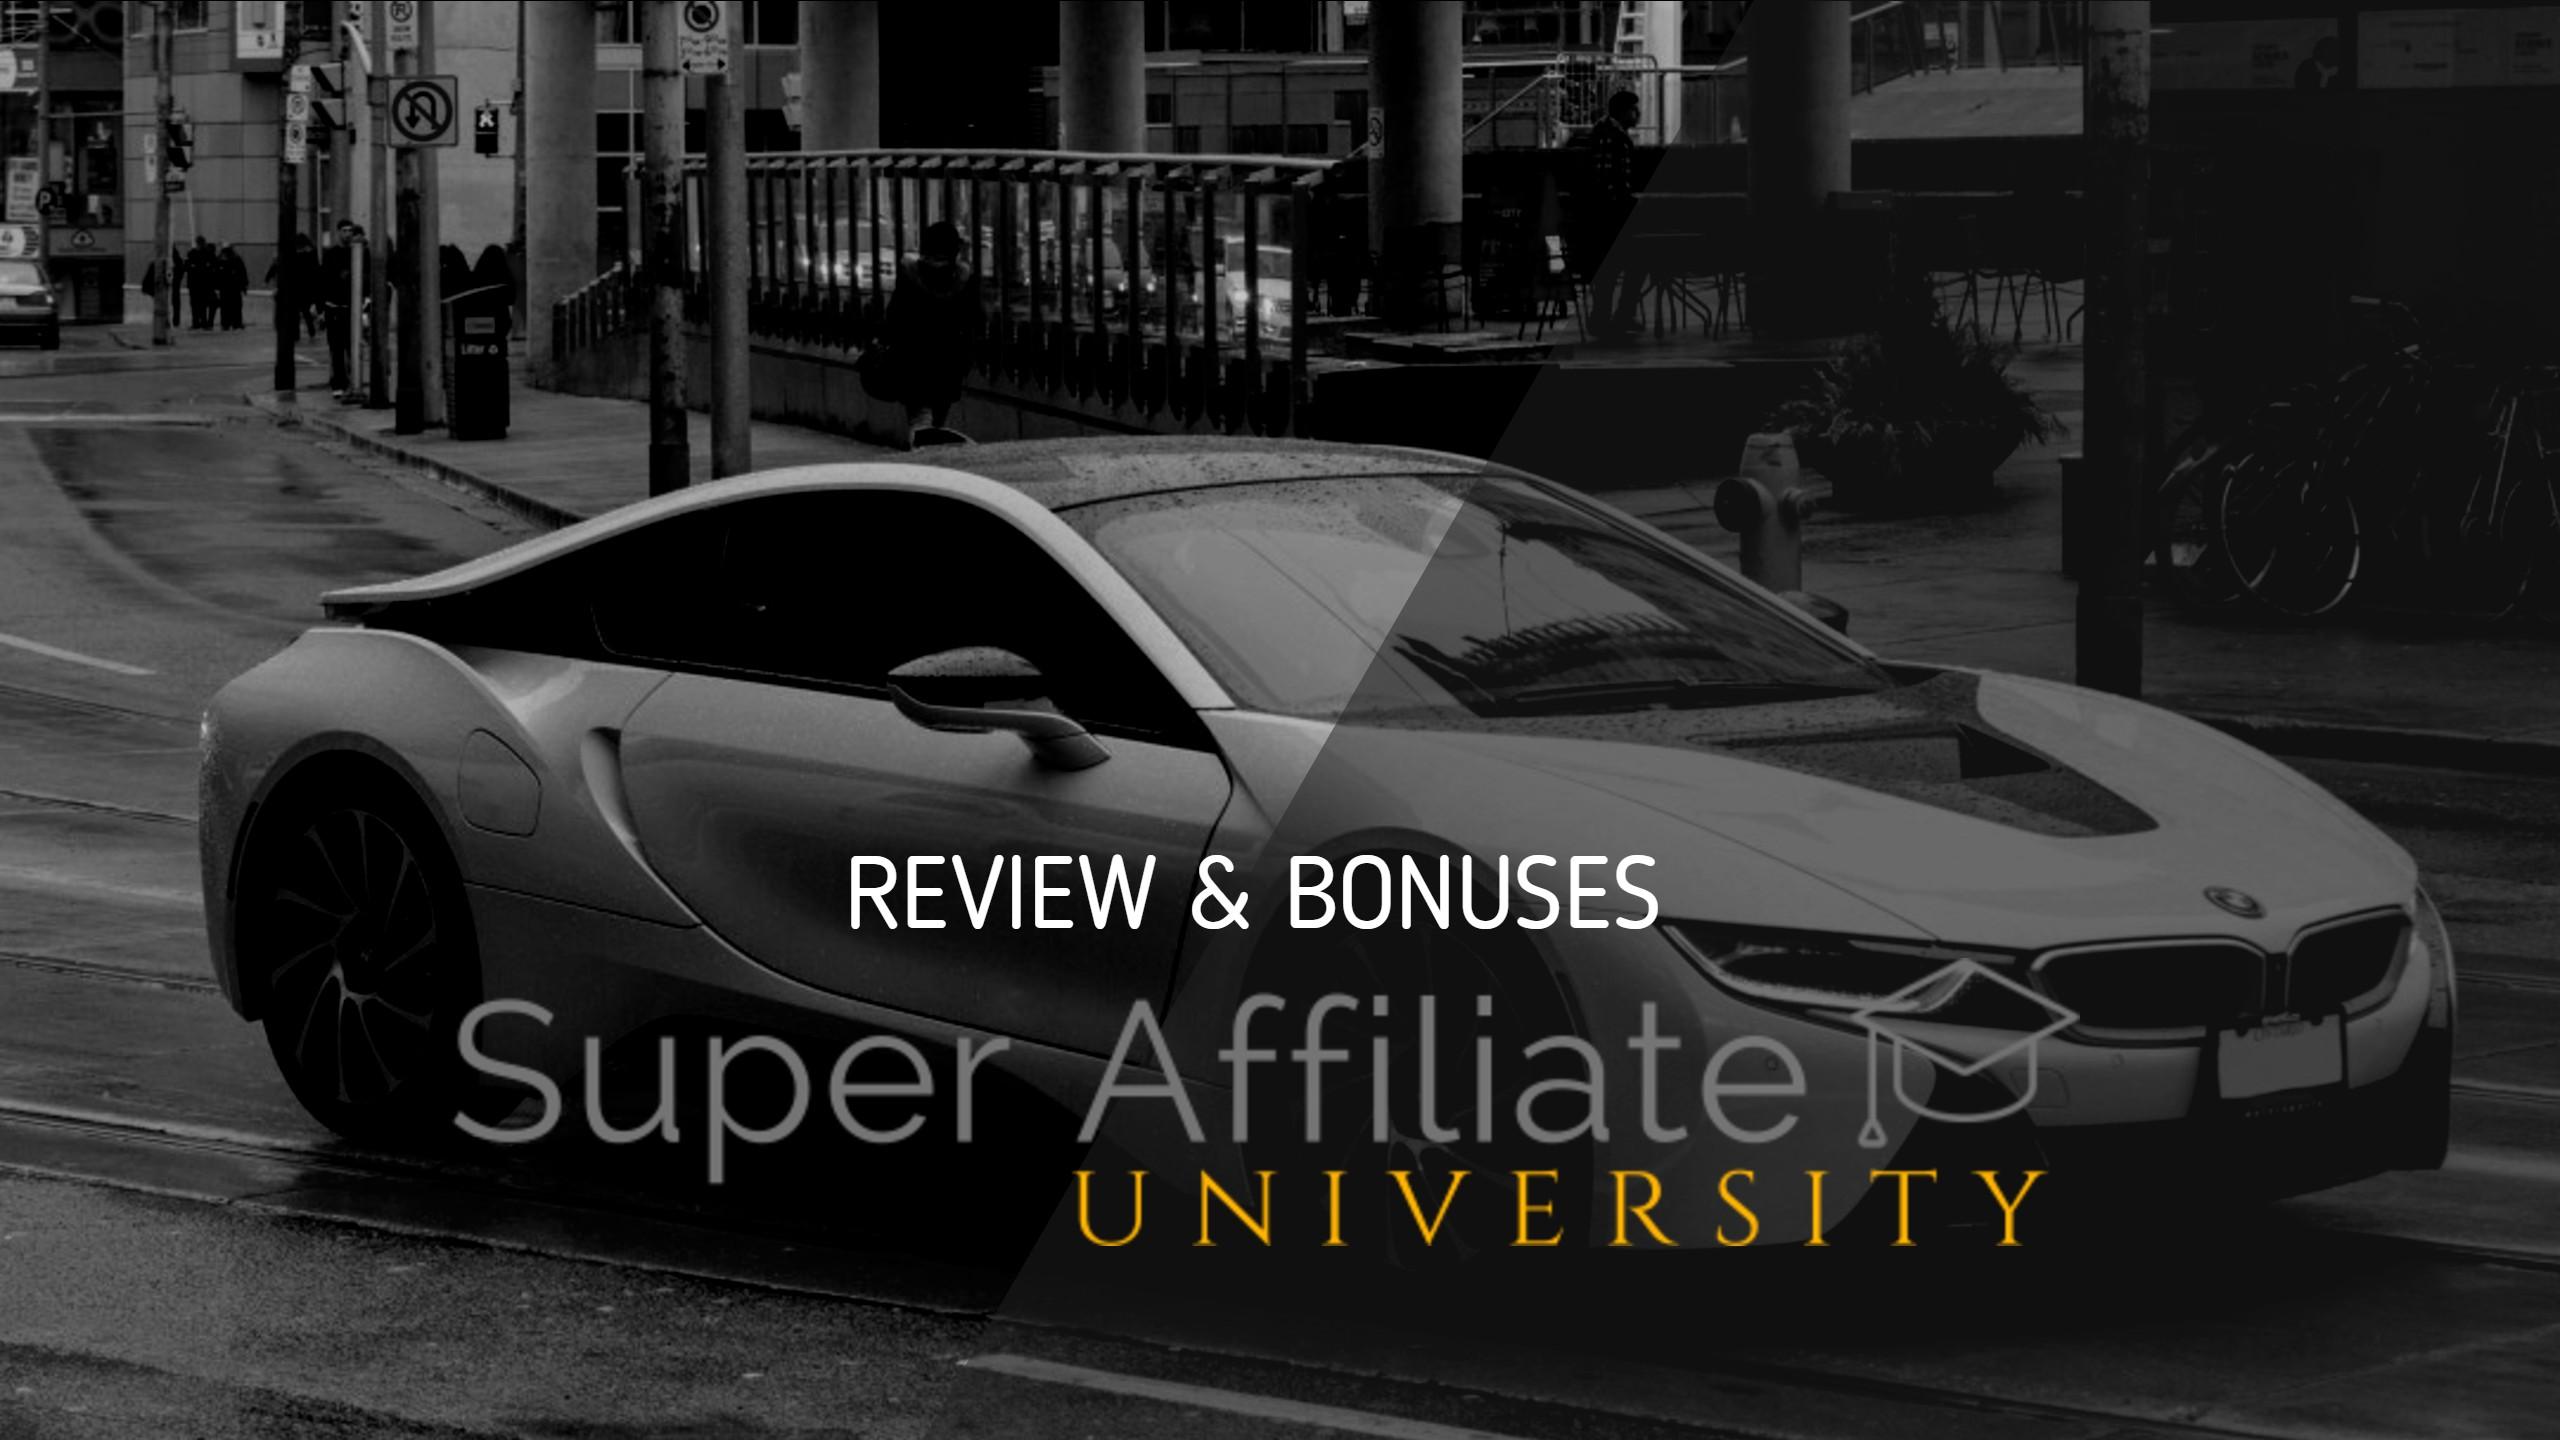 Super Affiliate University Review & Bonuses